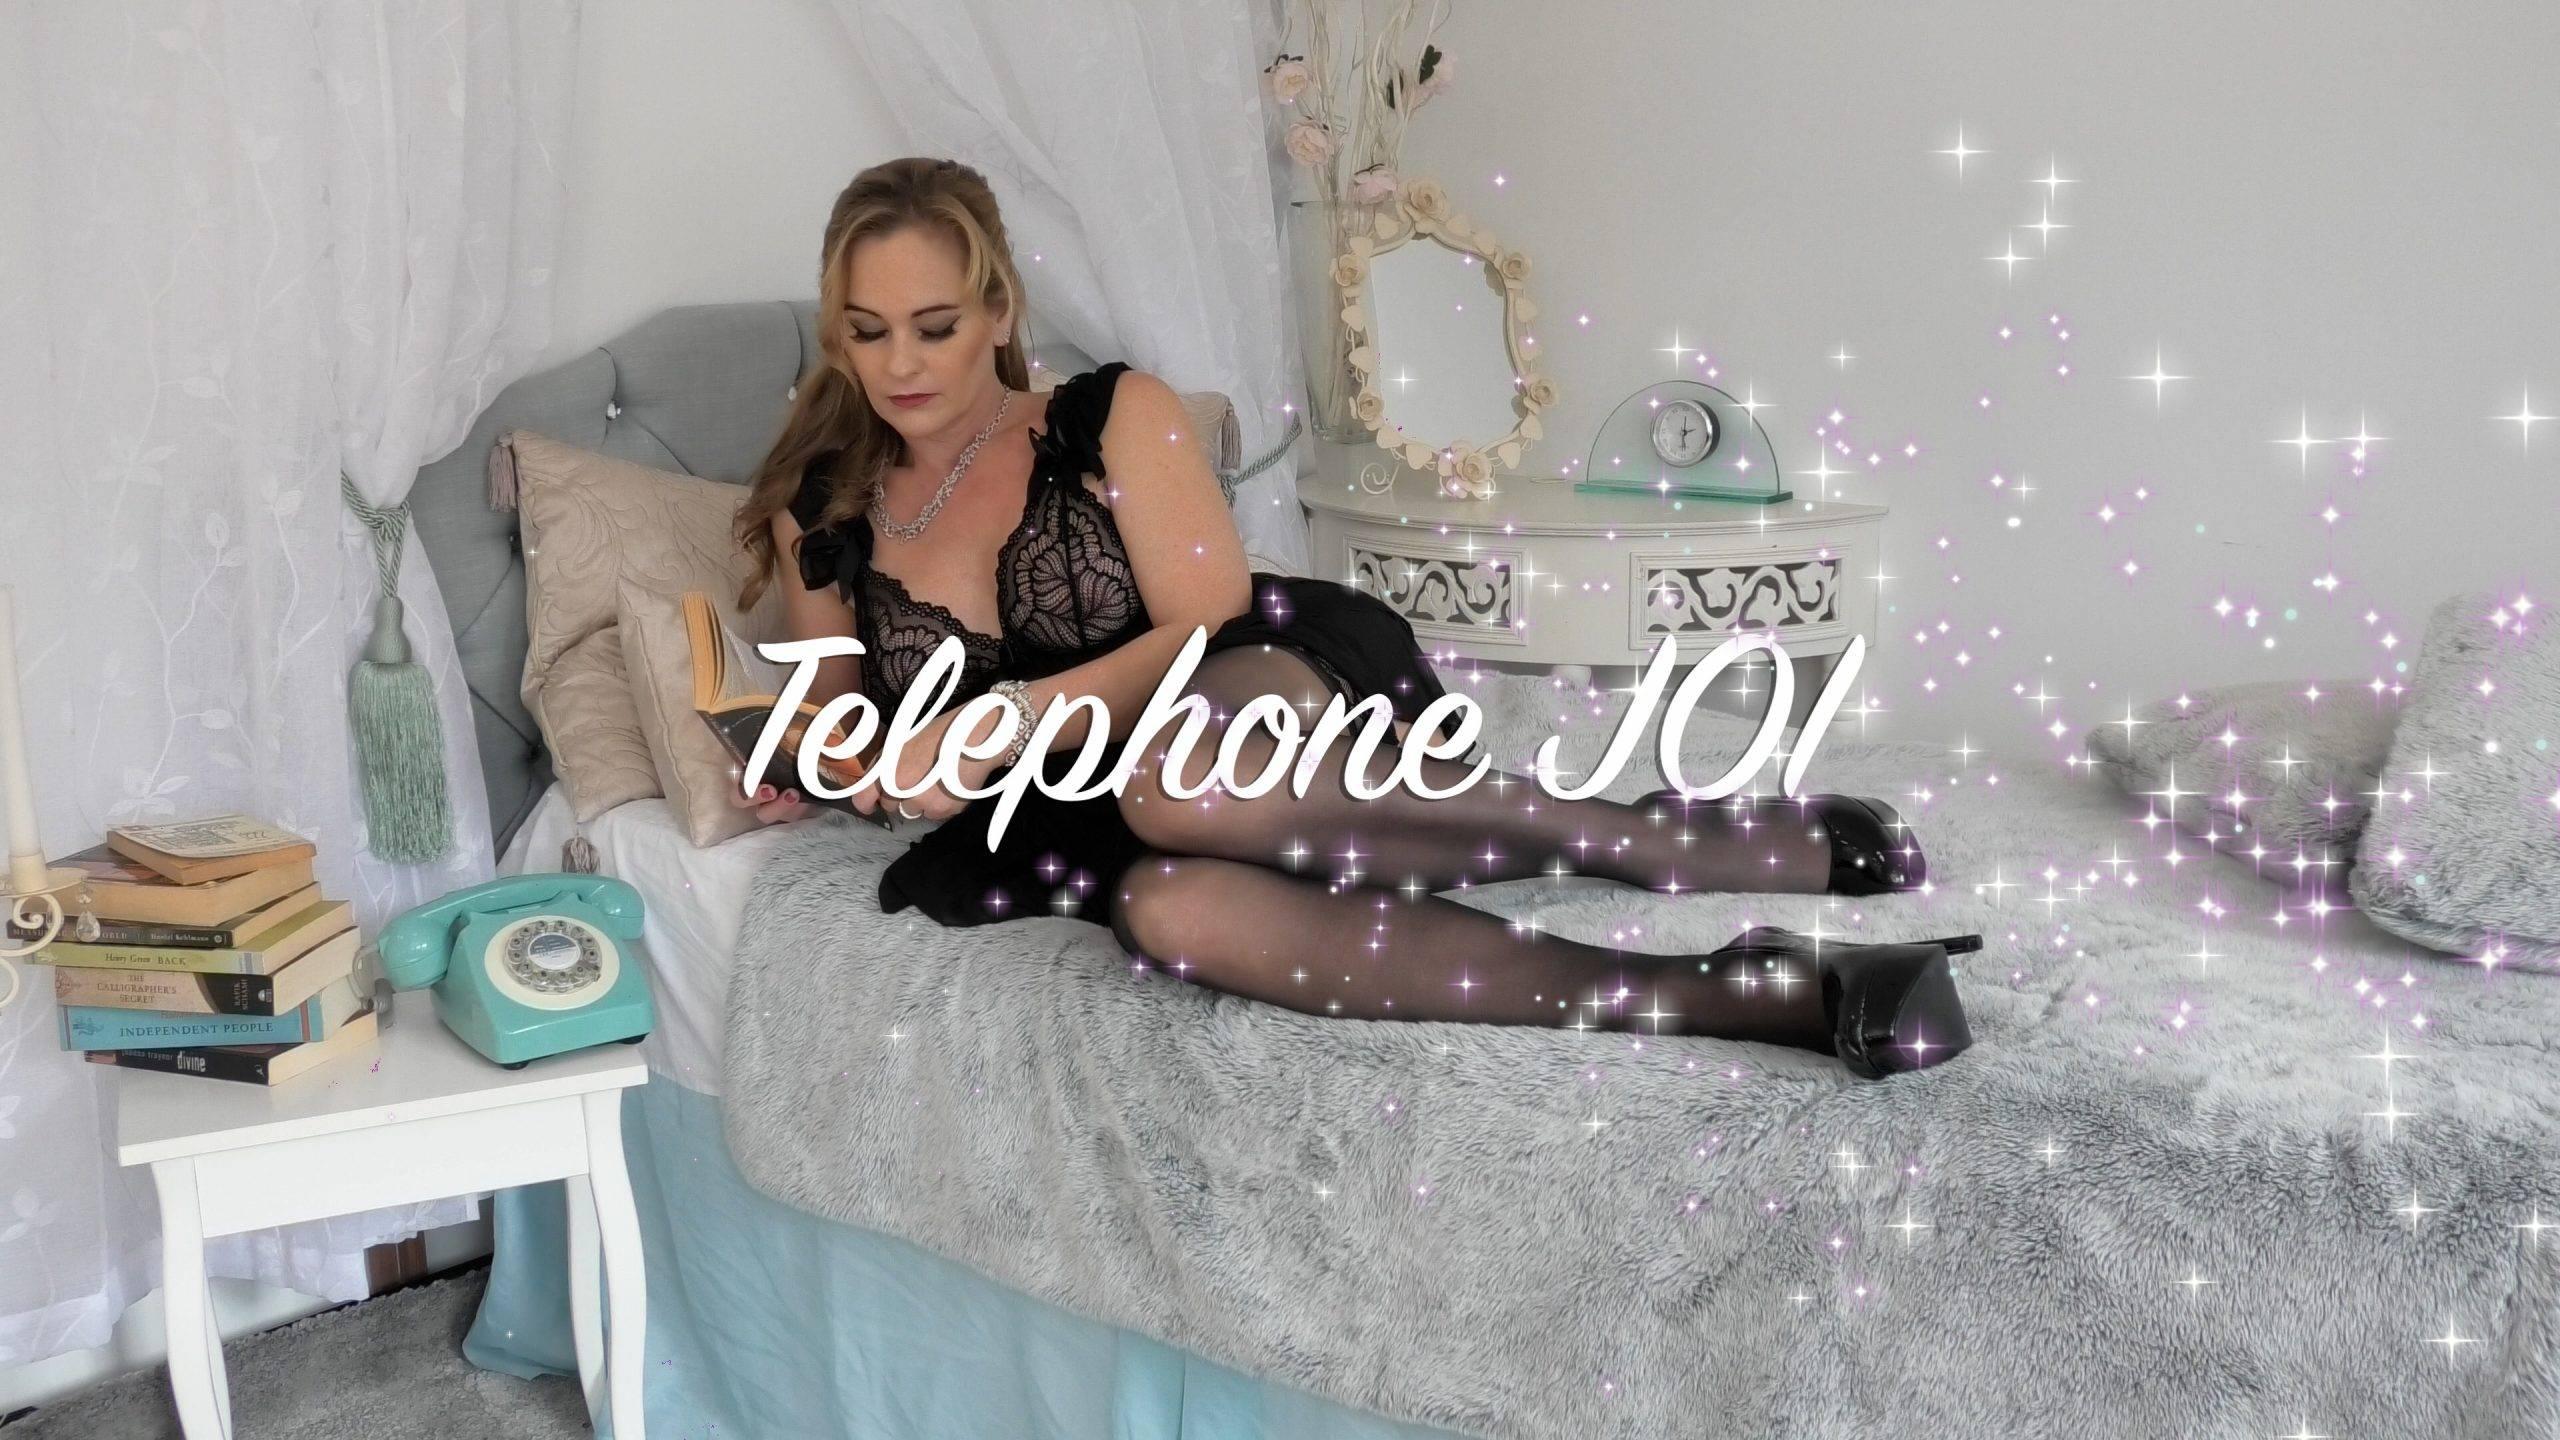 Telephone JOI Title